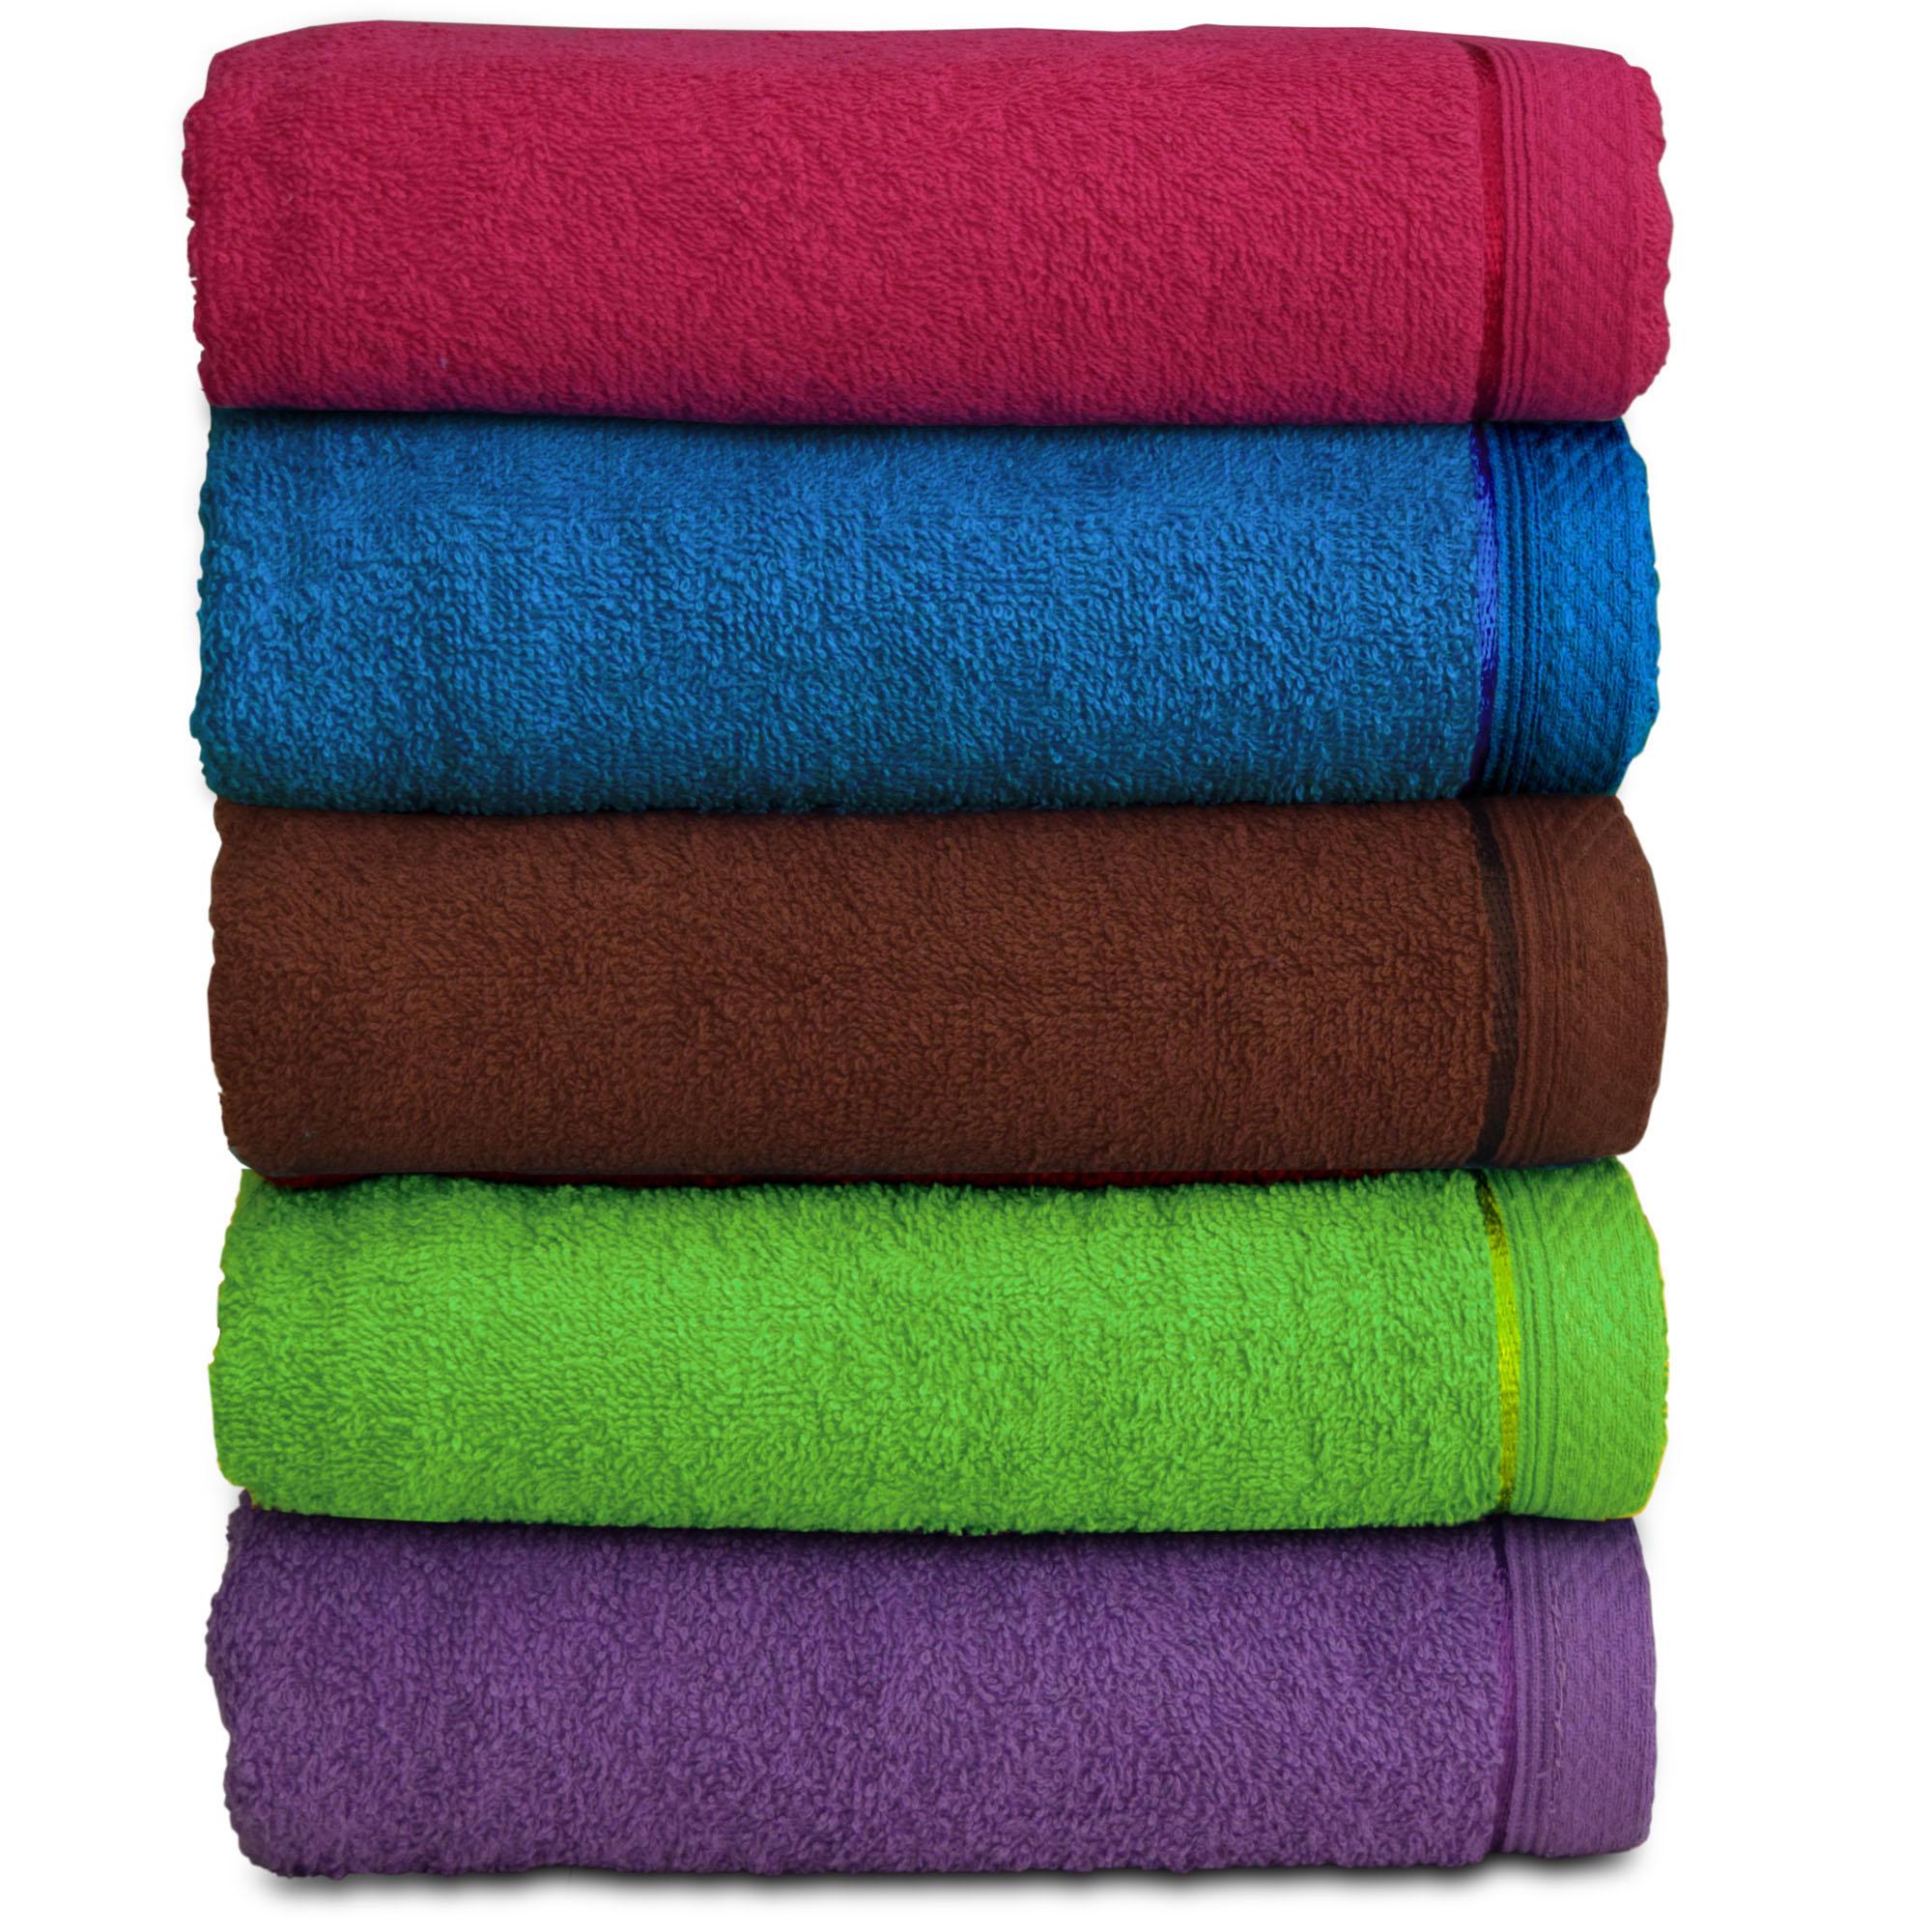 [SET OF 2 PCS] Essina Tobby 400G Soft Cotton Bath Towel 70cm x 140cm - 2 PIECE